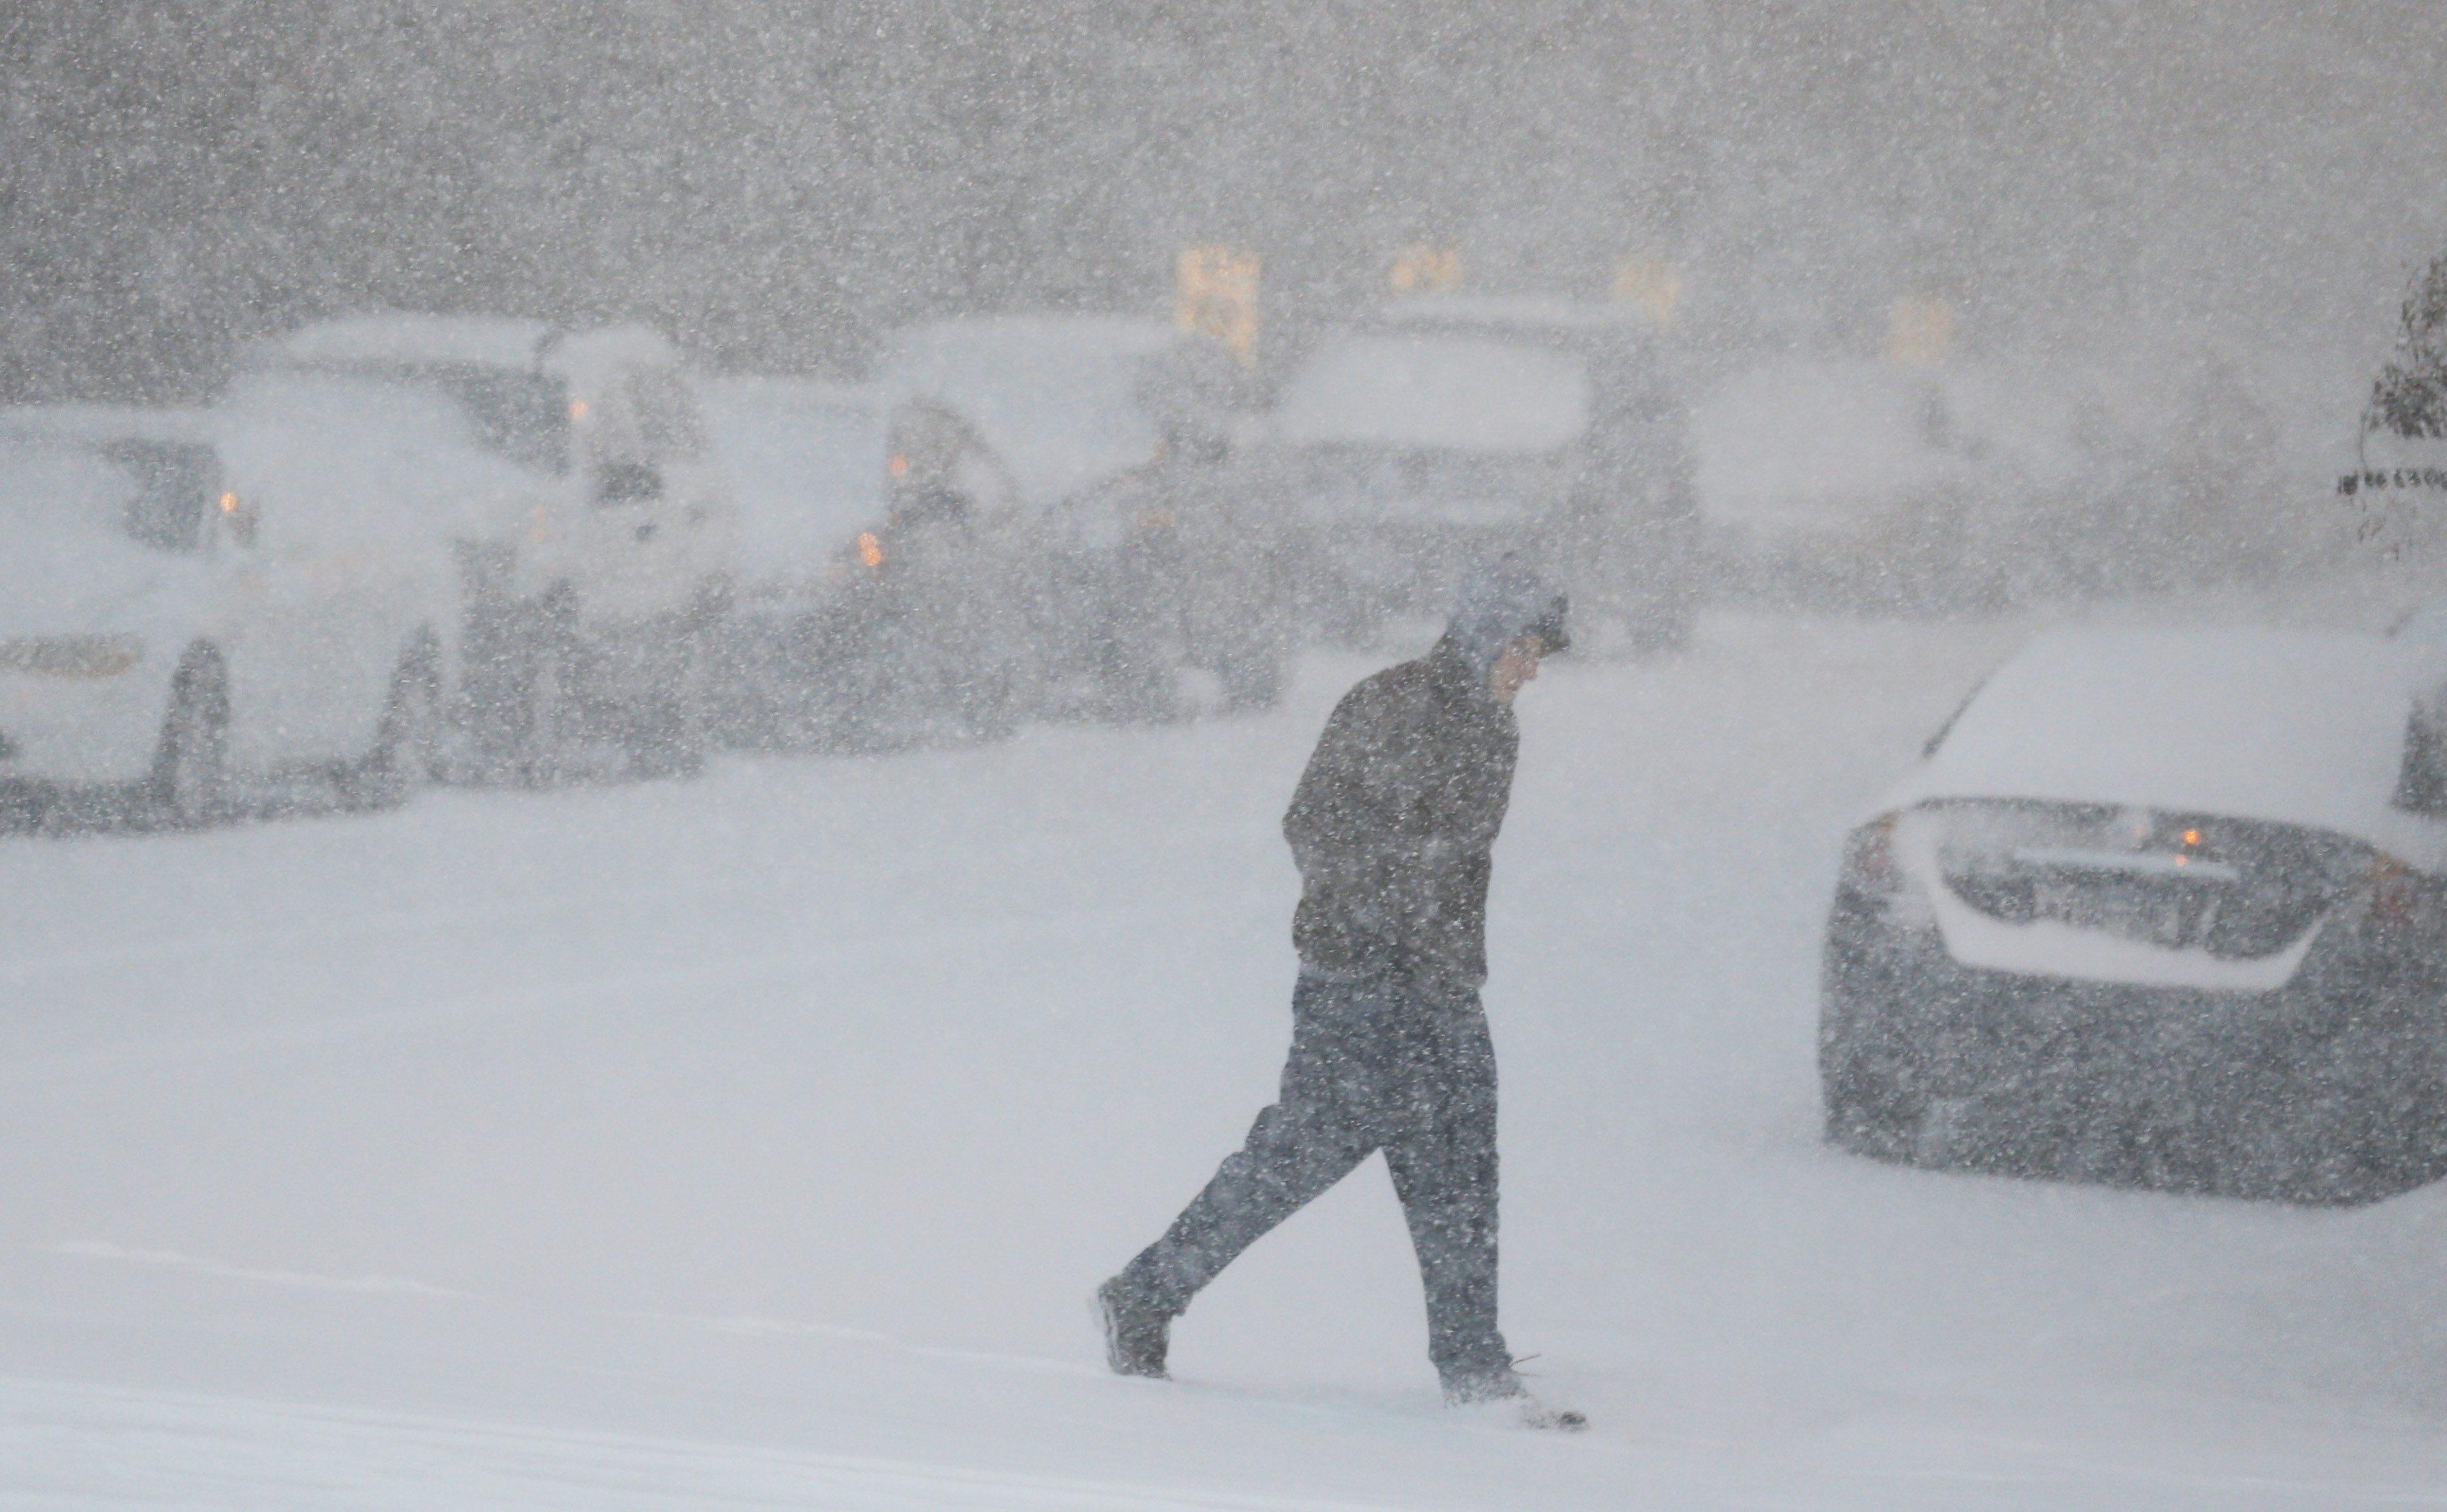 A pedestrian crosses the street near the Country Club Plaza shopping district Kansas City, Mo., Thursday, Feb. 21, 2013.